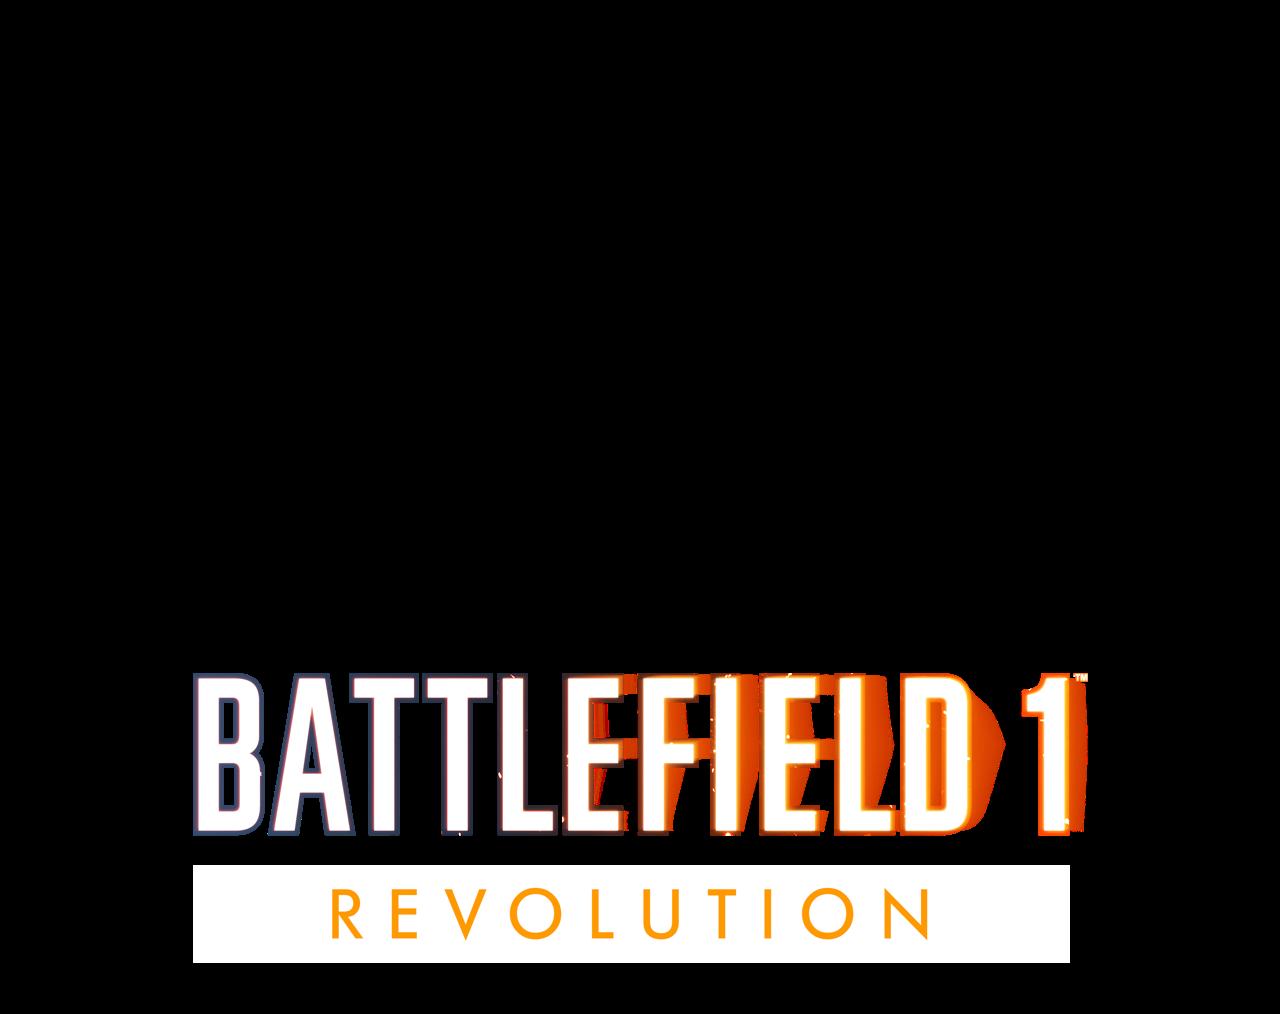 battlefield 1 crack keygen